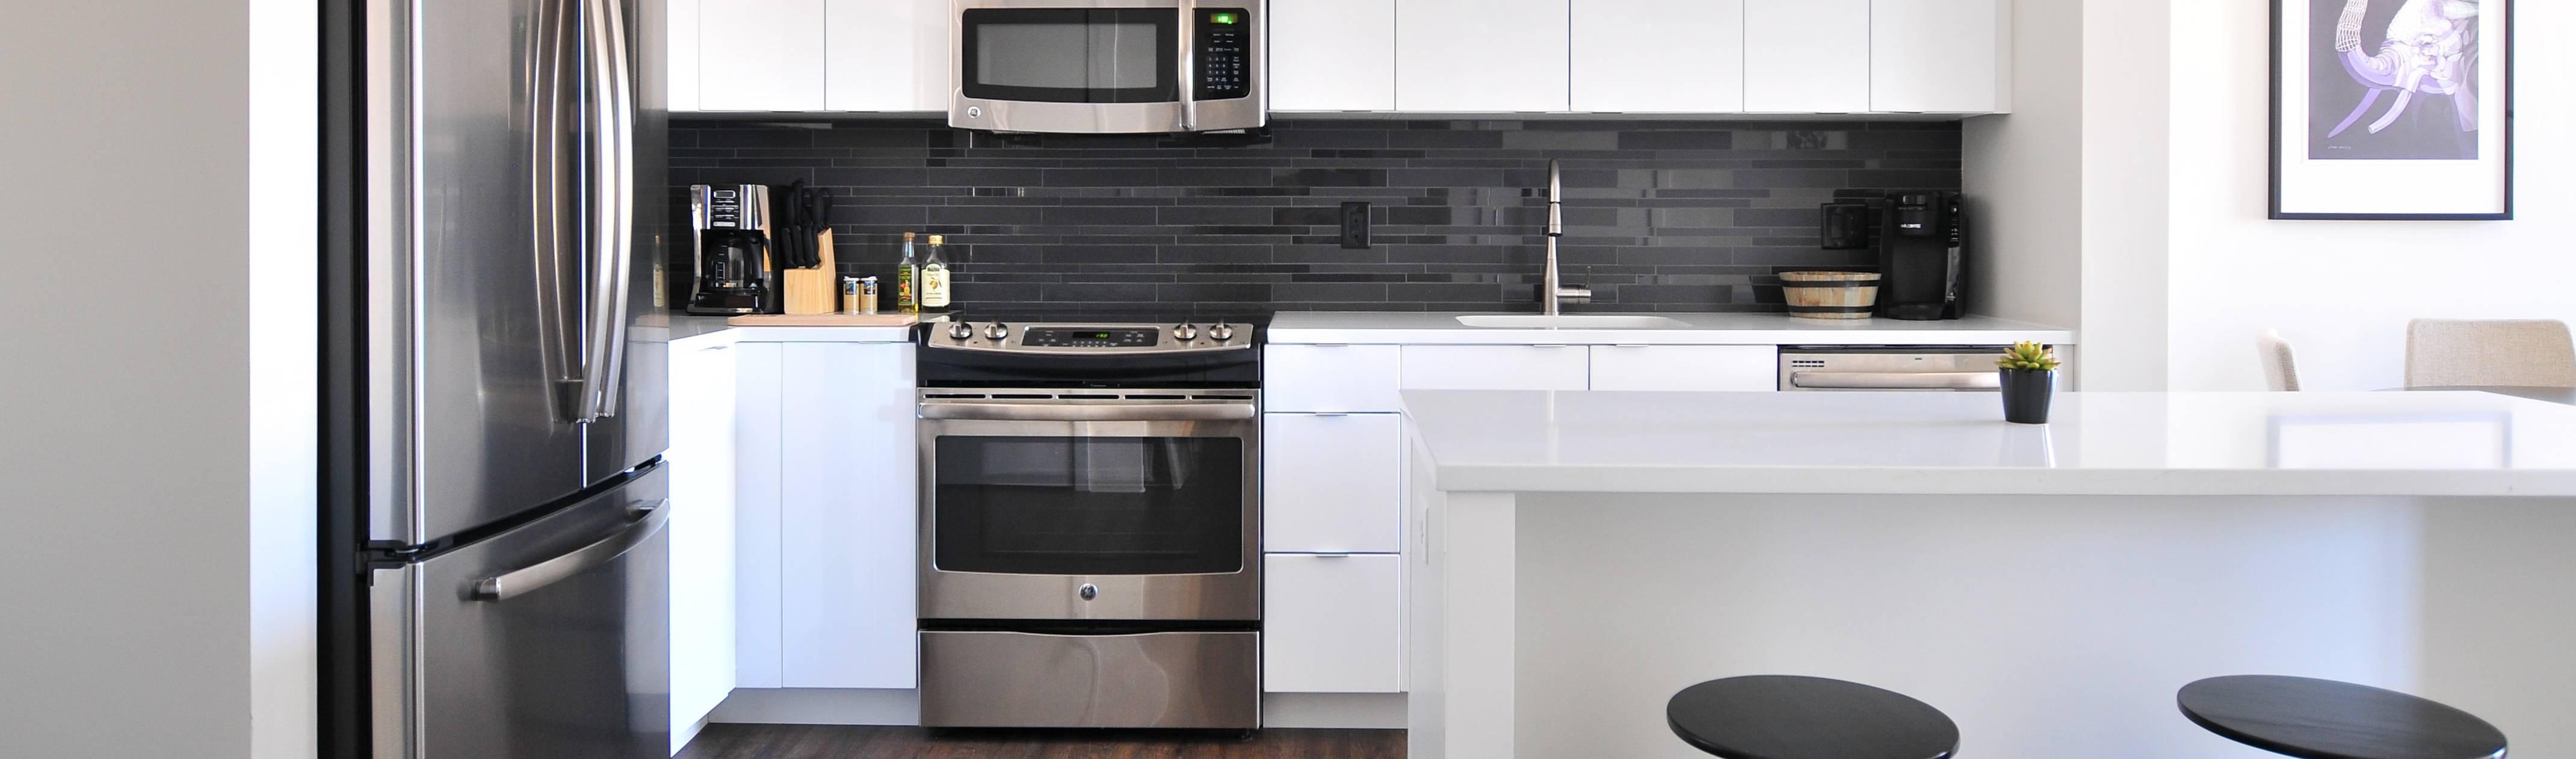 Blackrock Modular Kitchen